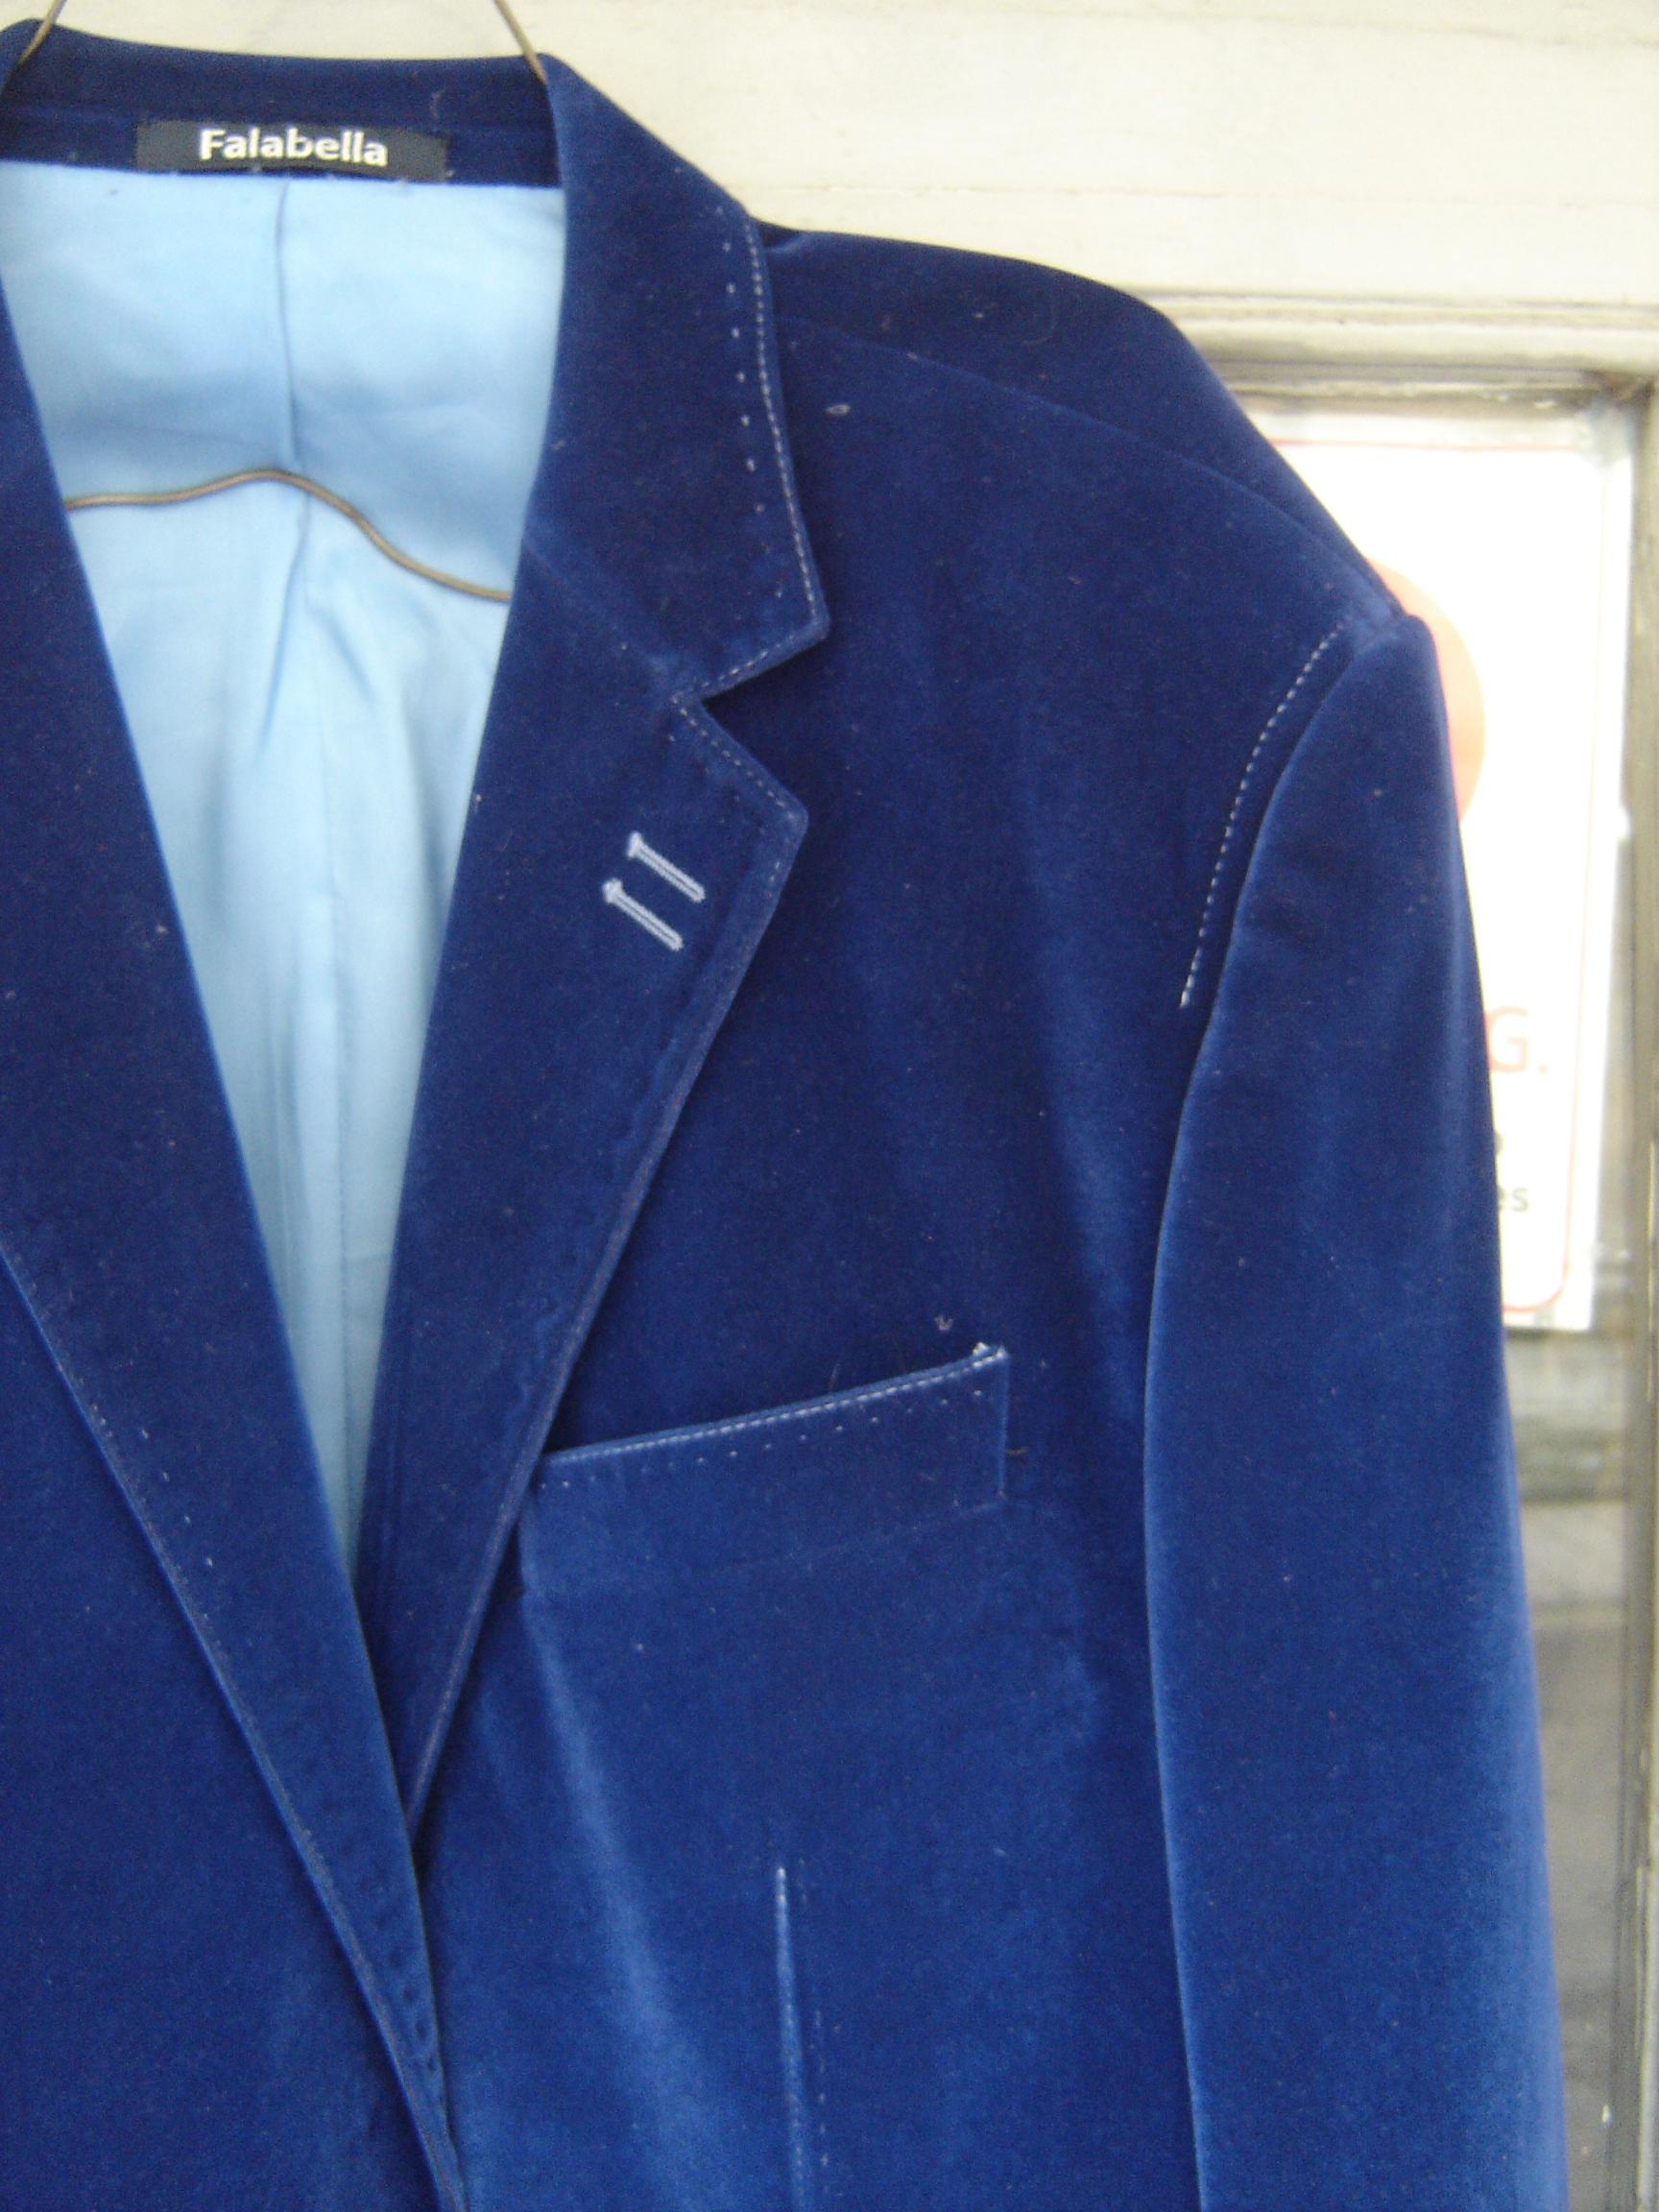 Falabella indigo velvet jacket